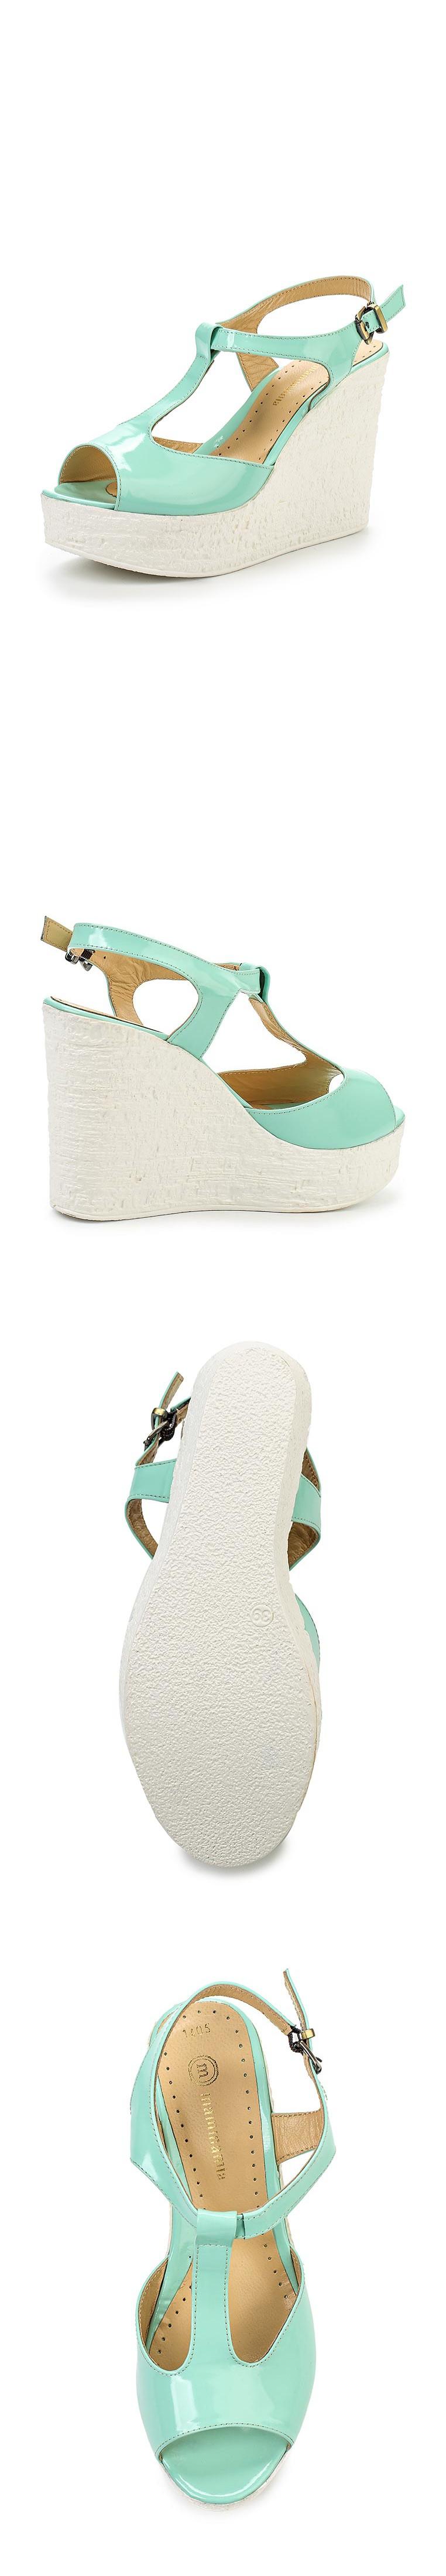 e1f63759c Женская обувь босоножки Mamma Mia за 5380.00 руб. | Женские ...